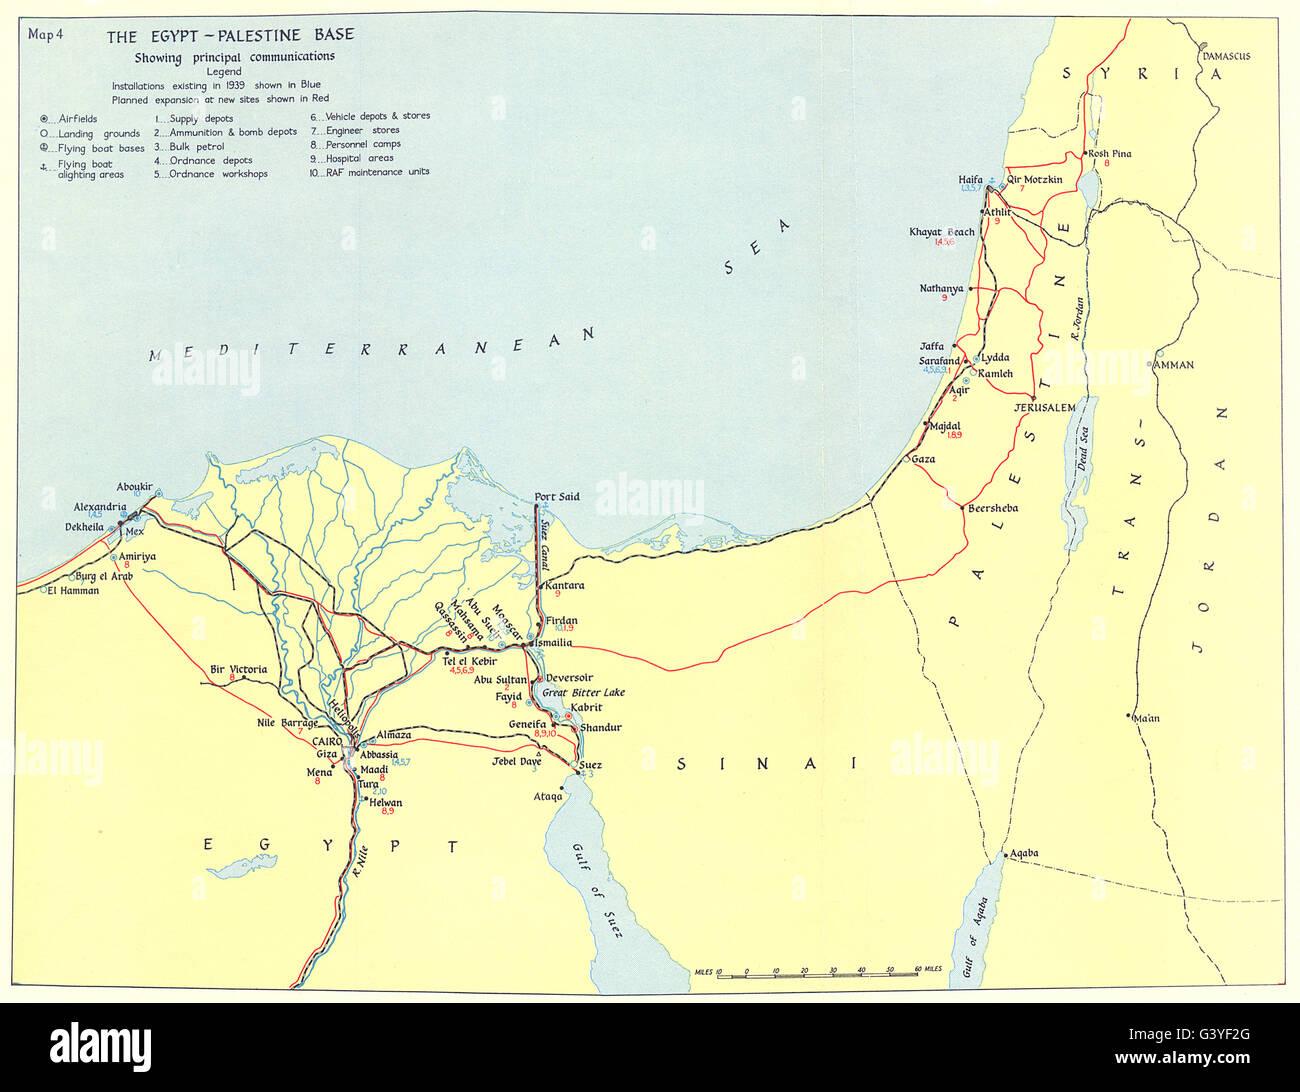 EGYPT Logistics EgyptPalestine Base Communications - Vintage map of egypt